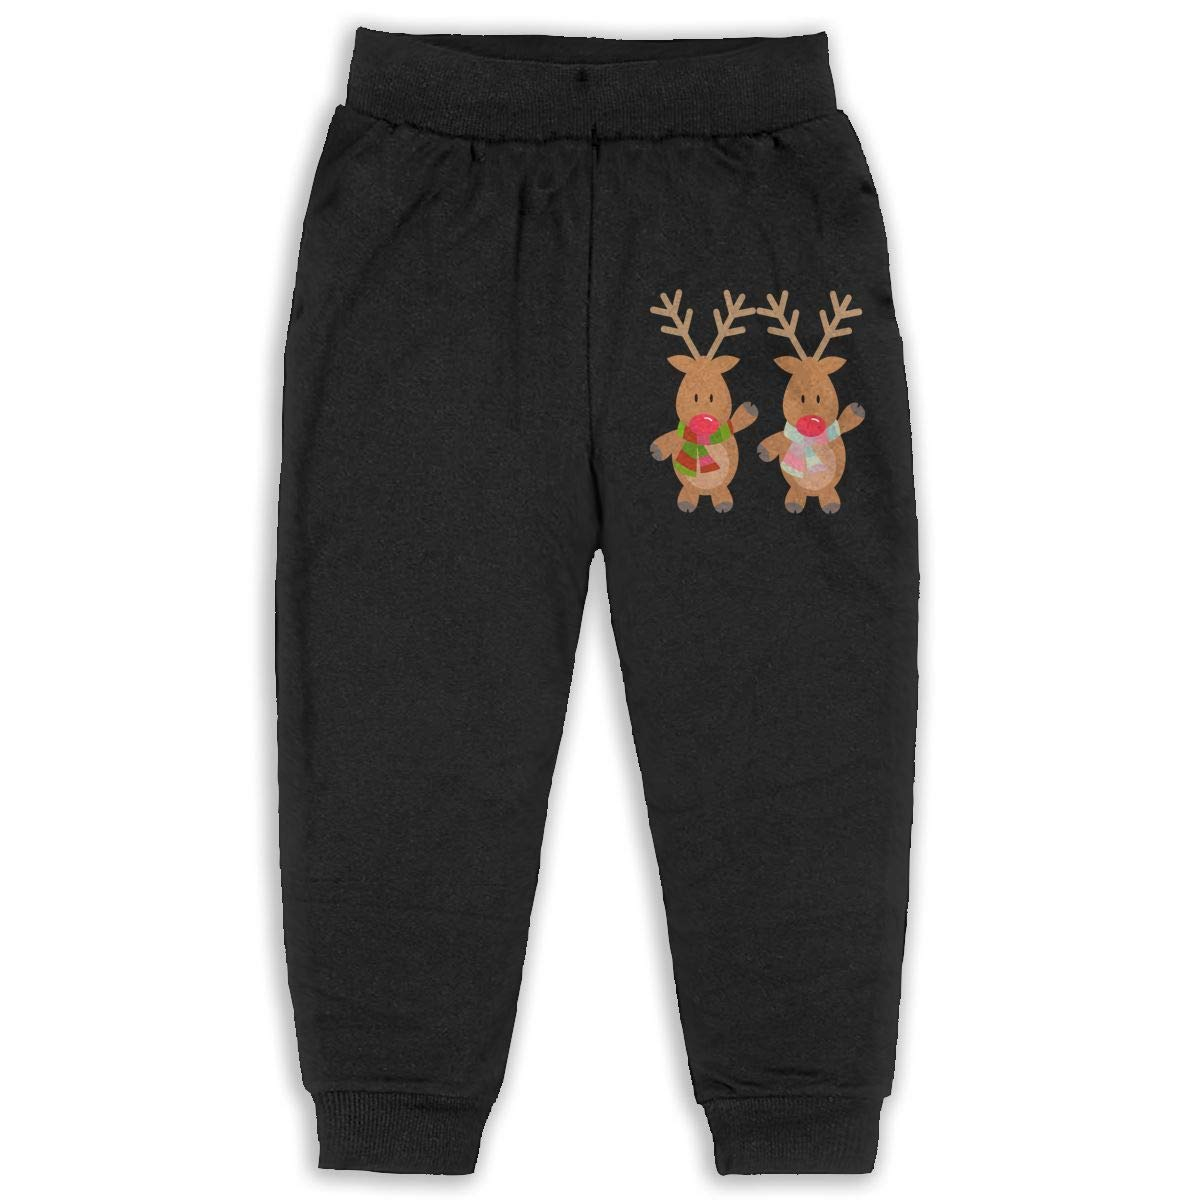 ELCW37K Kids /& Toddler Pants Soft Cozy Baby Sweatpants Cute Christmas Reindeer Fleece Pants Training Pants